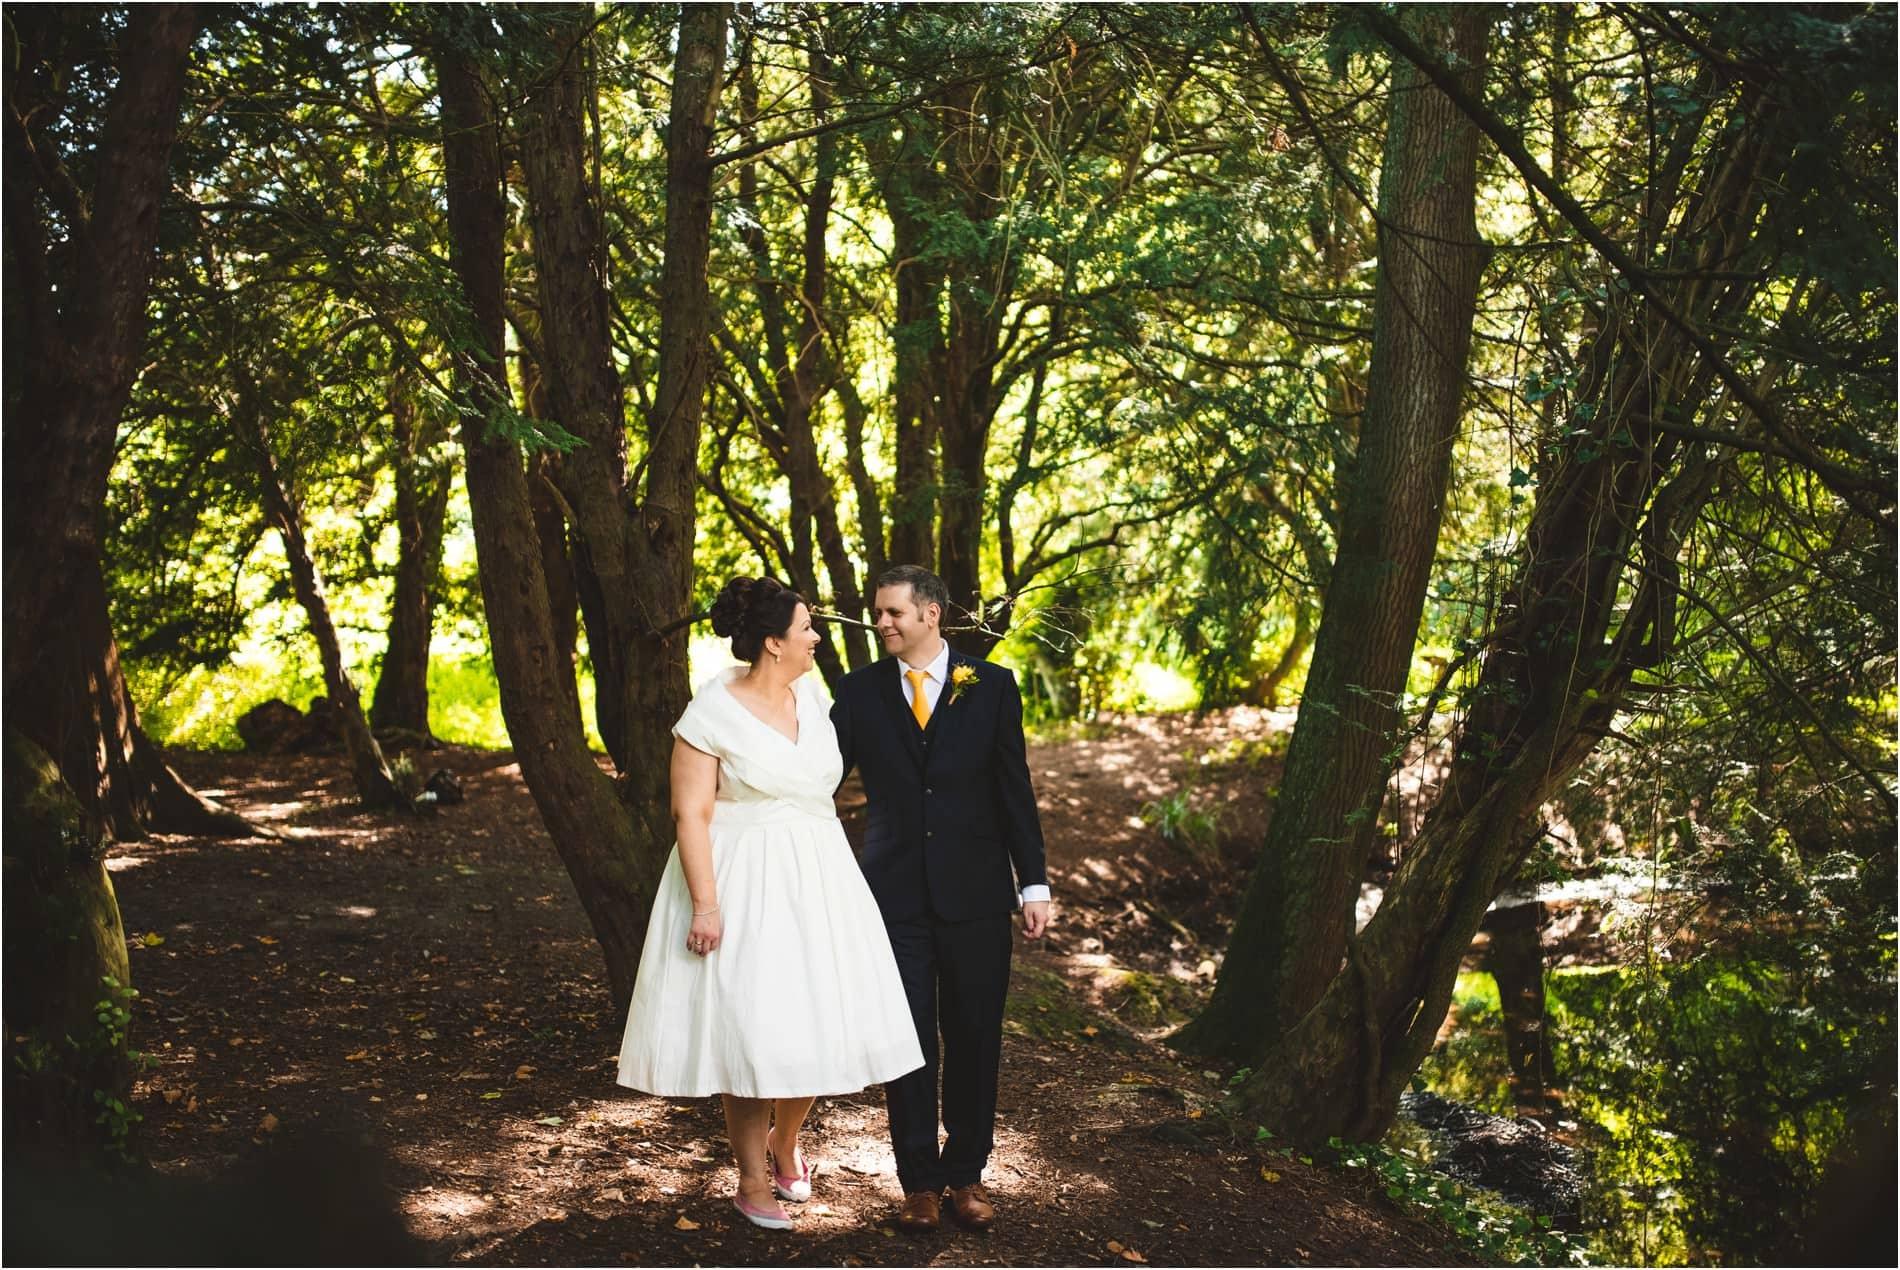 Bury St Edmunds Wedding